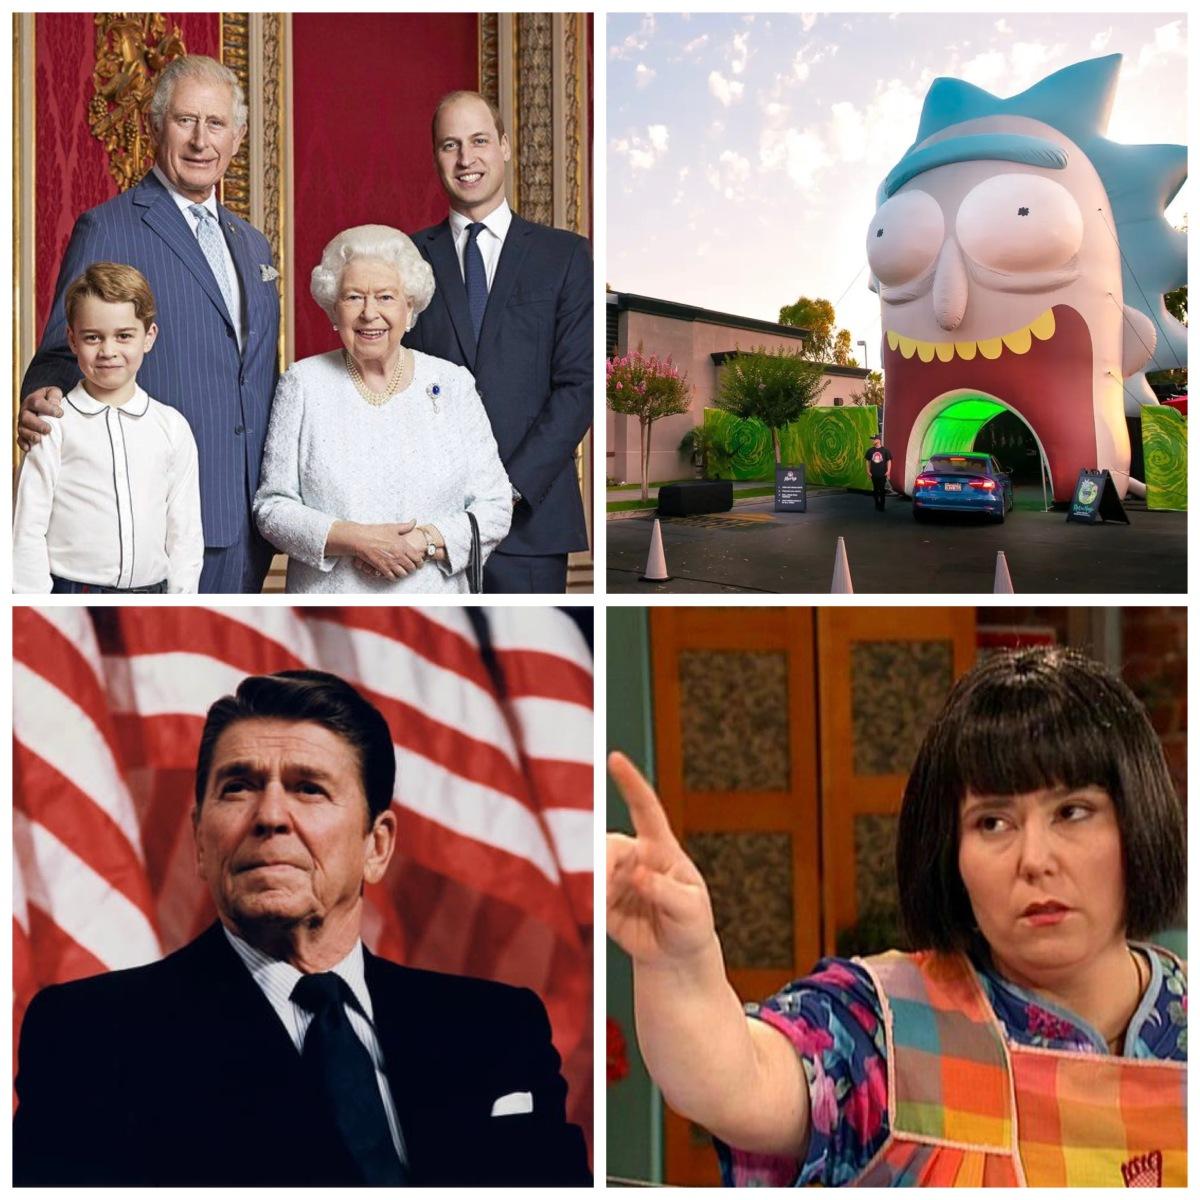 The British Royal Family, Rick and Morty at Wendy's, Ronald Reagan, and Mad TV's Ms. Swan.